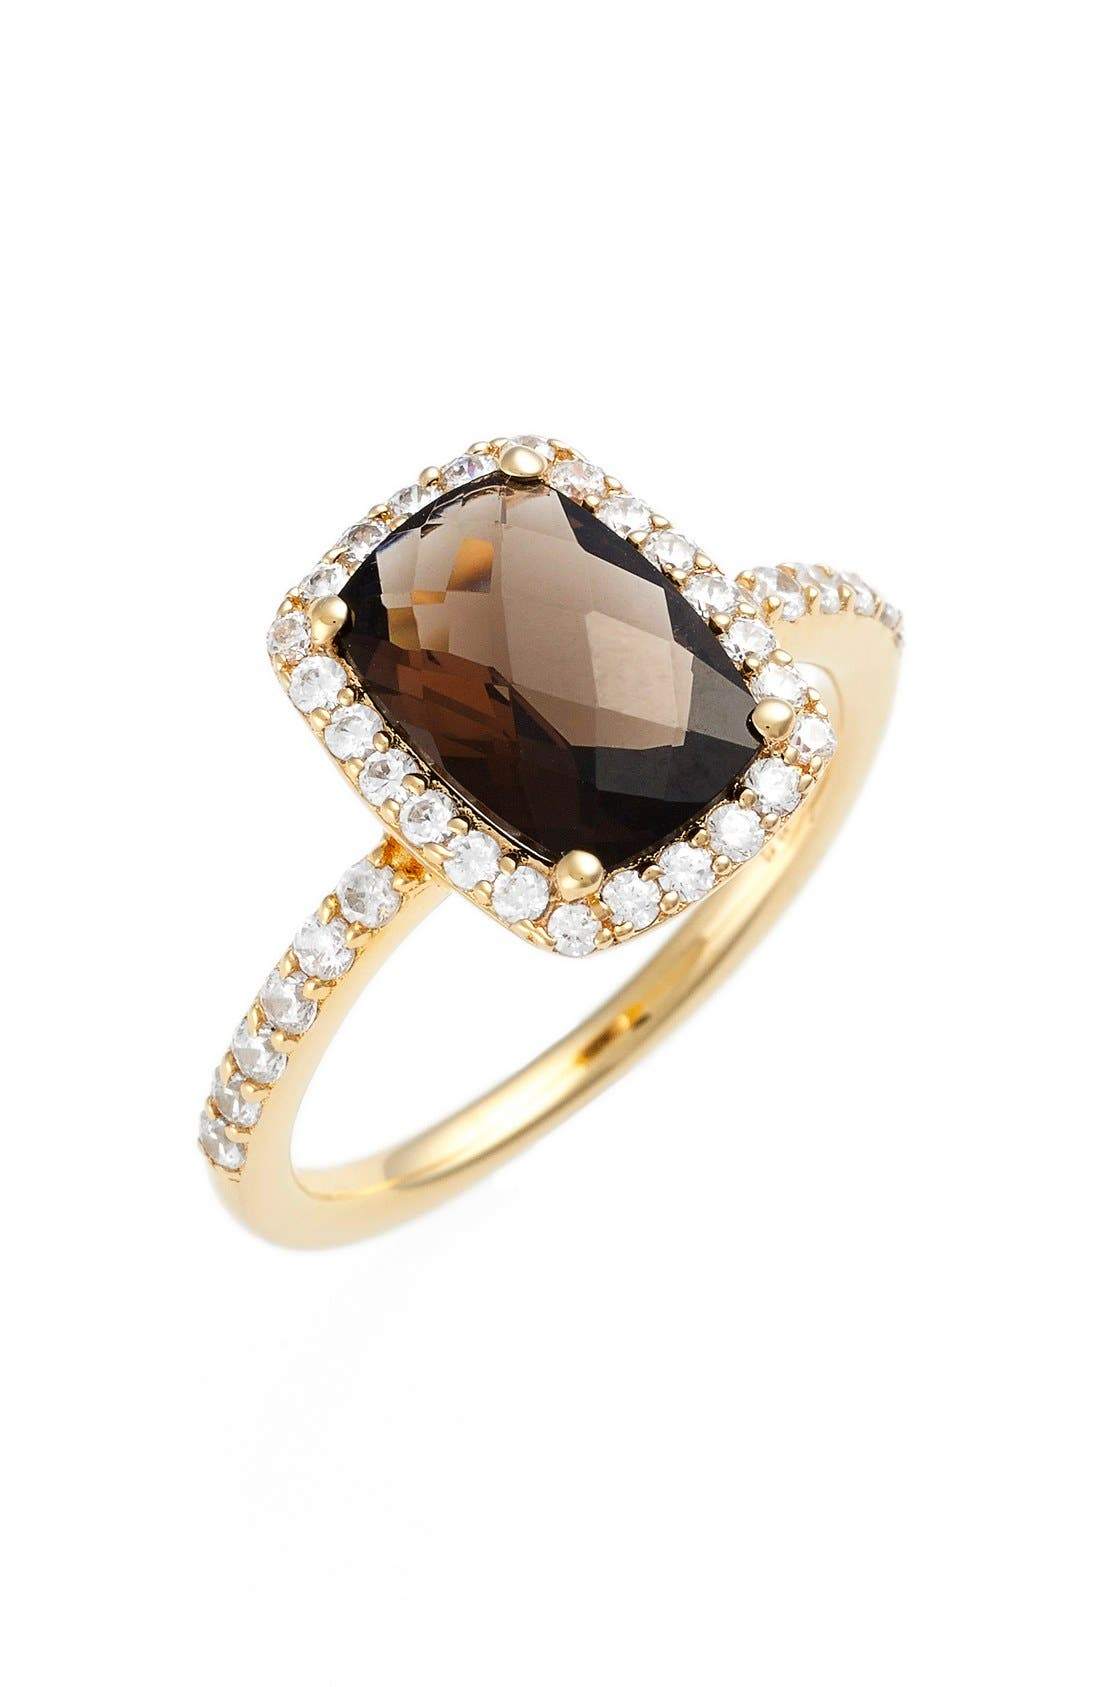 'Aria' Rectangle Cushion Cut Ring,                             Main thumbnail 1, color,                             Gold/ Smokey Quartz